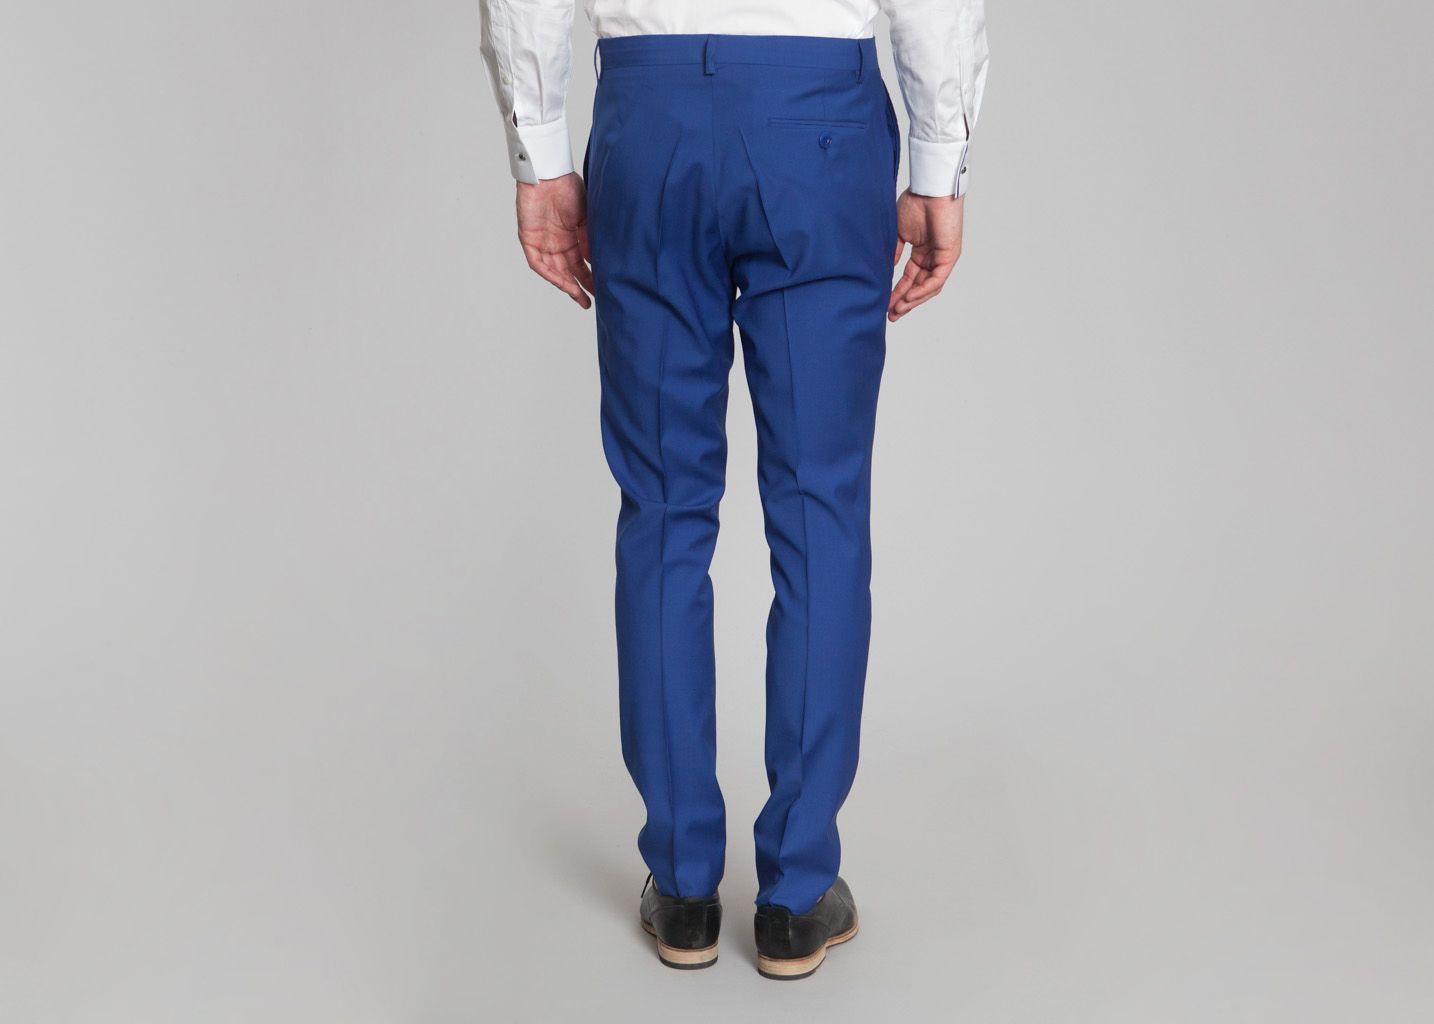 Pantalon Dialogue - Etudes